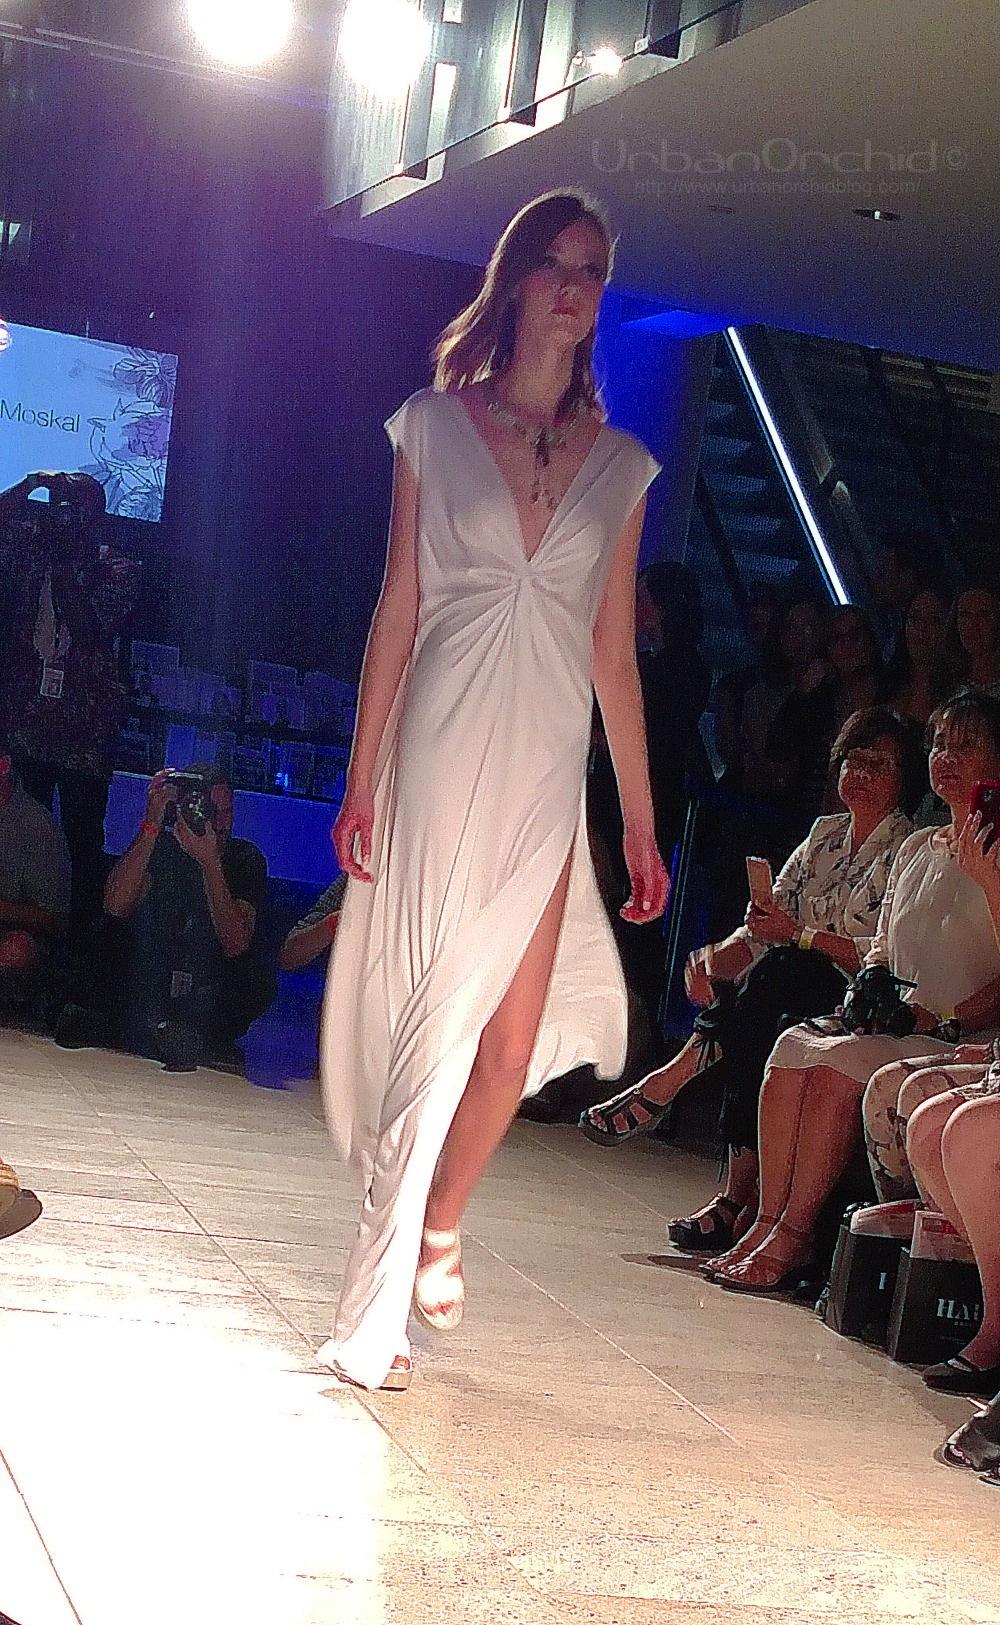 Goddess-y dress by George Moskal